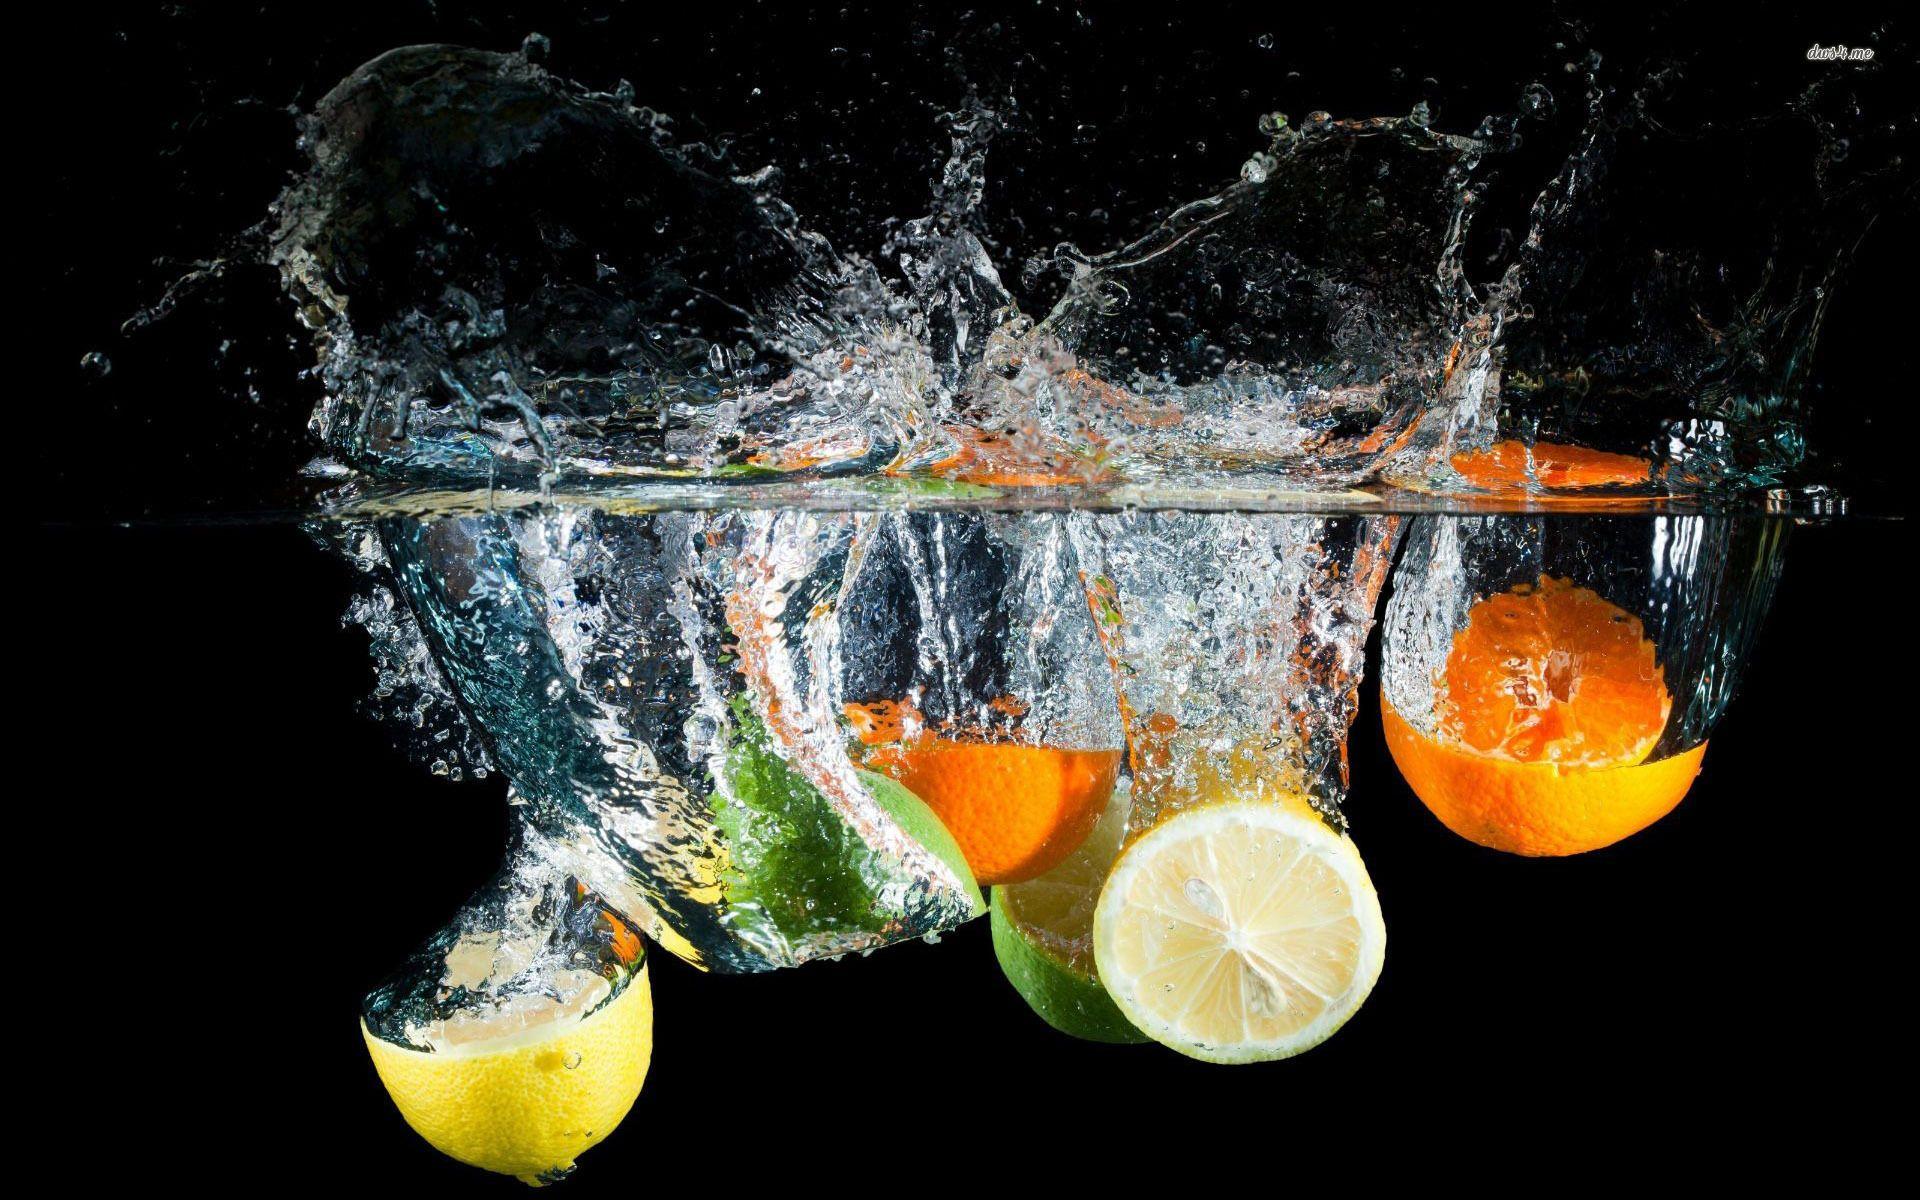 Colorful Lemon Fruit Hd Wallpaper Free Download Splash